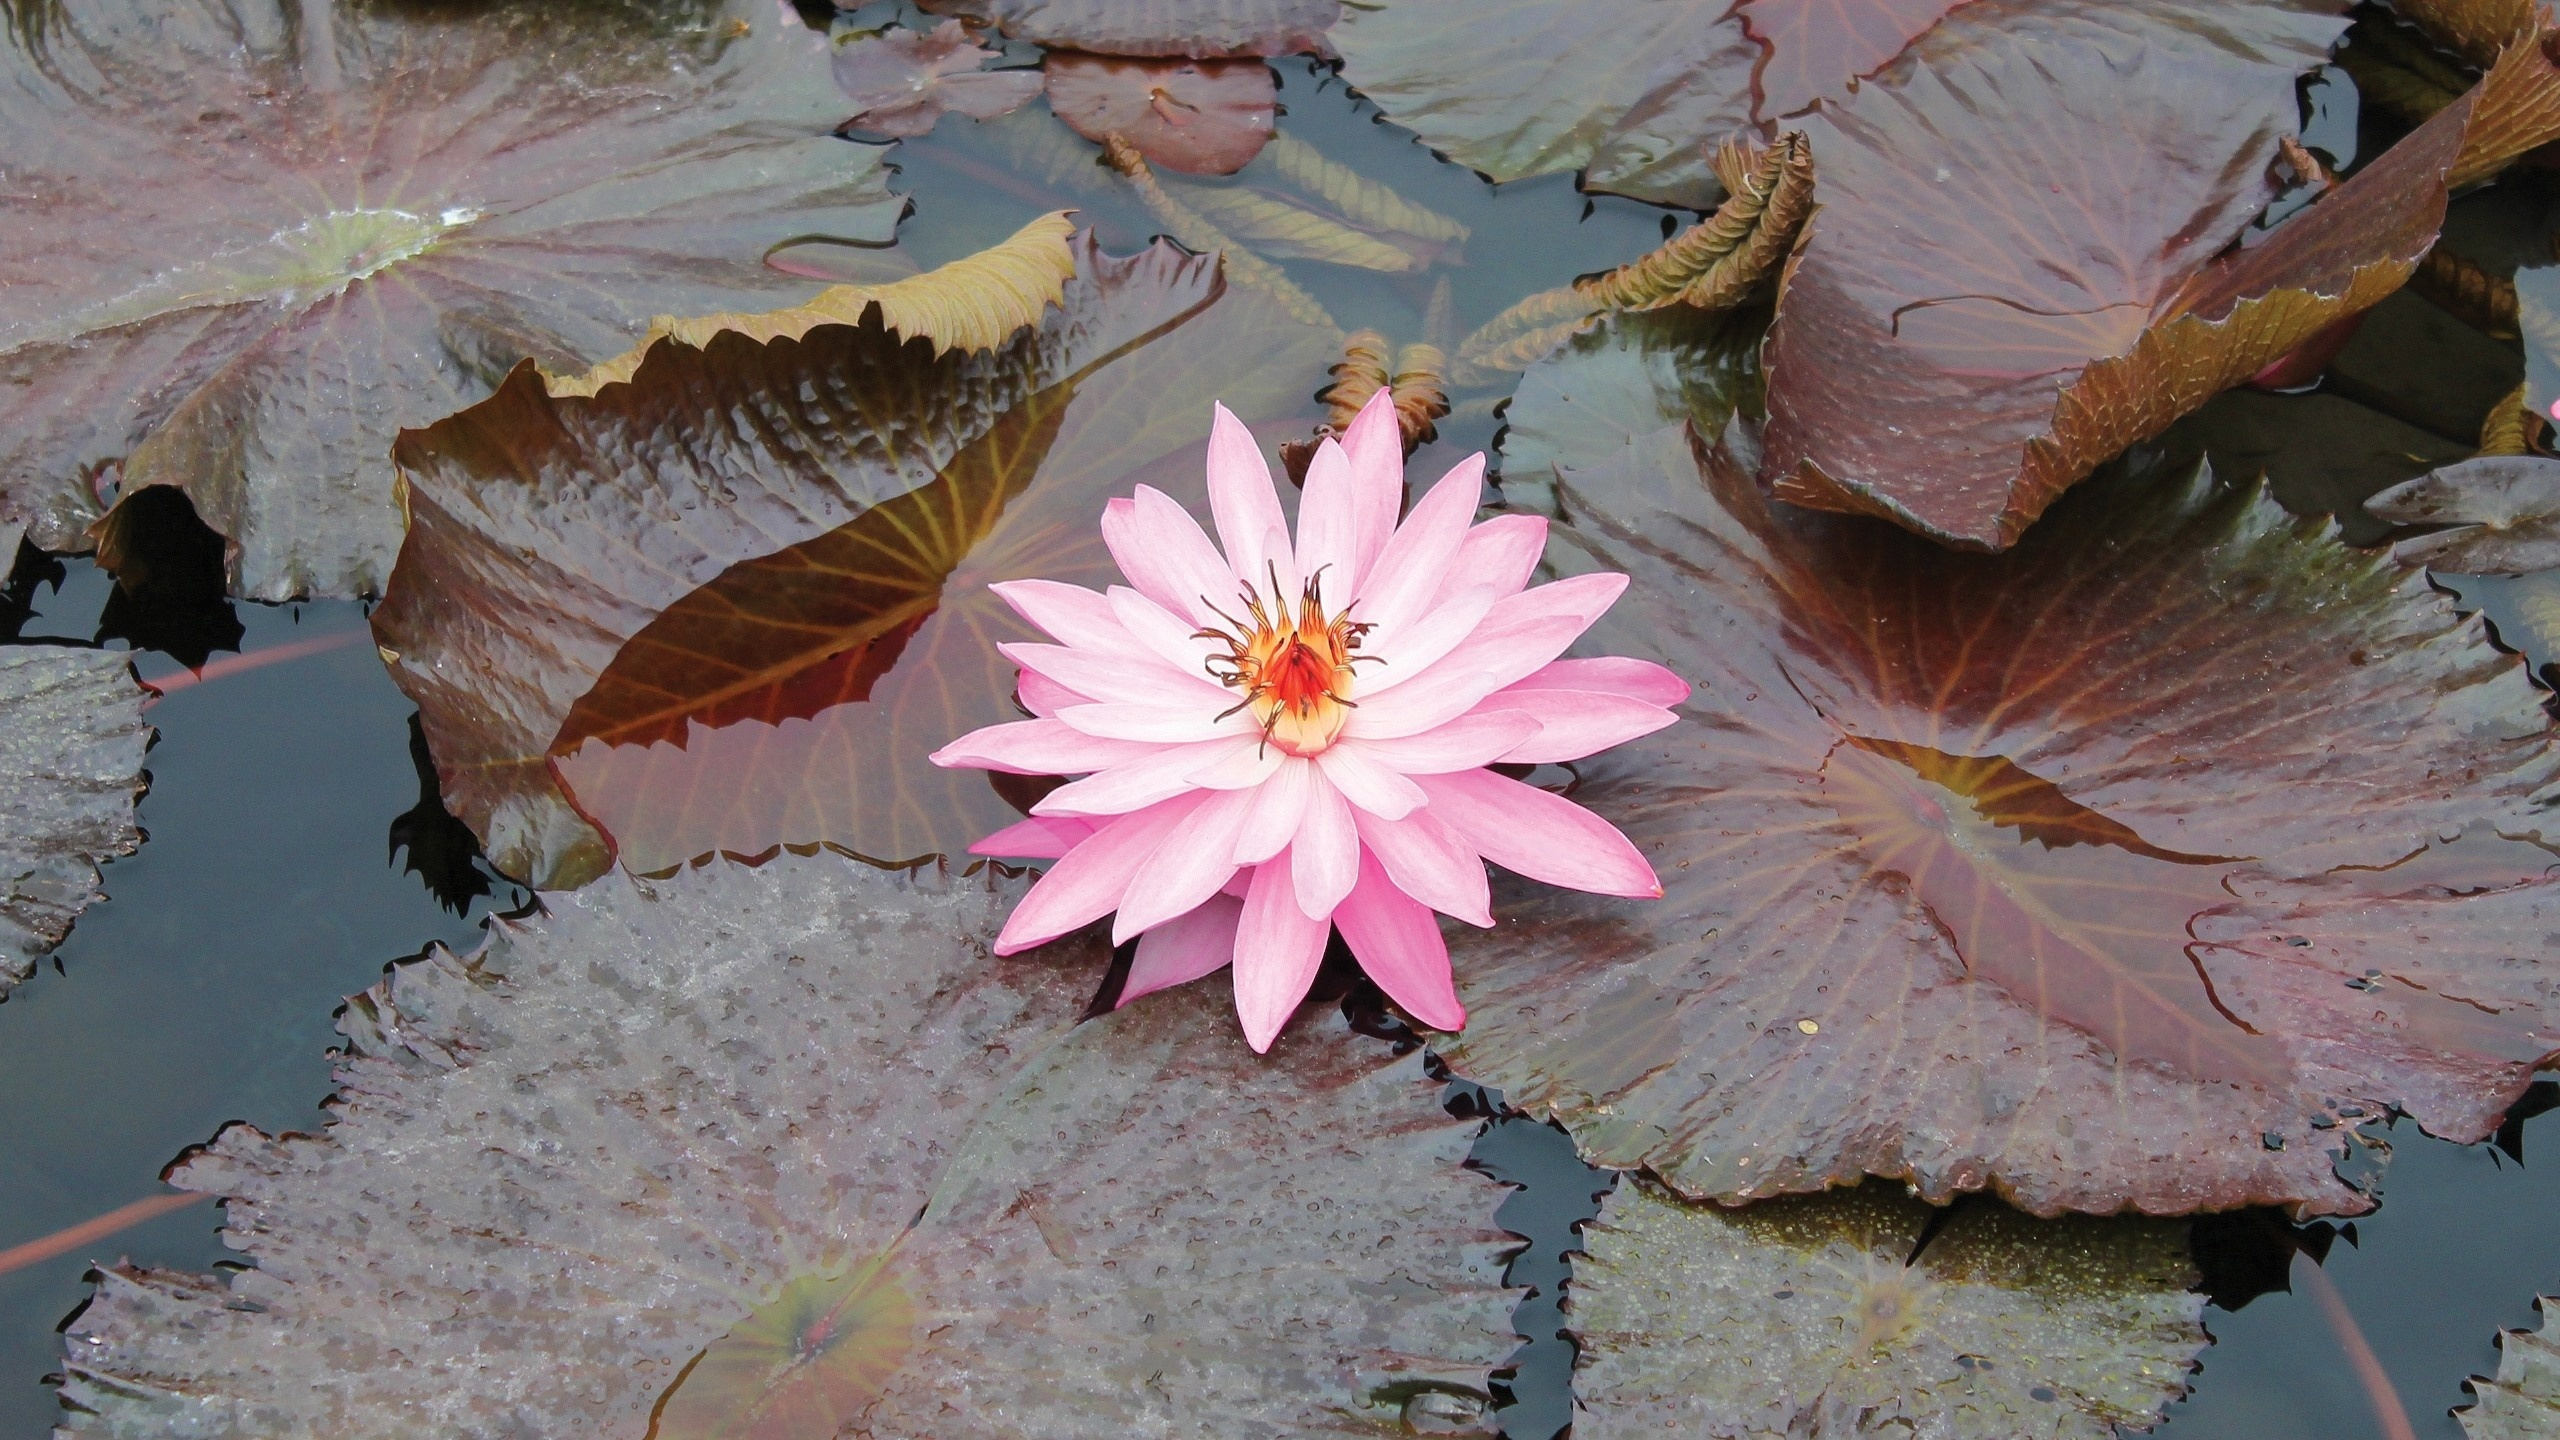 розовая, кувшинка, лепестки, листья, пруд